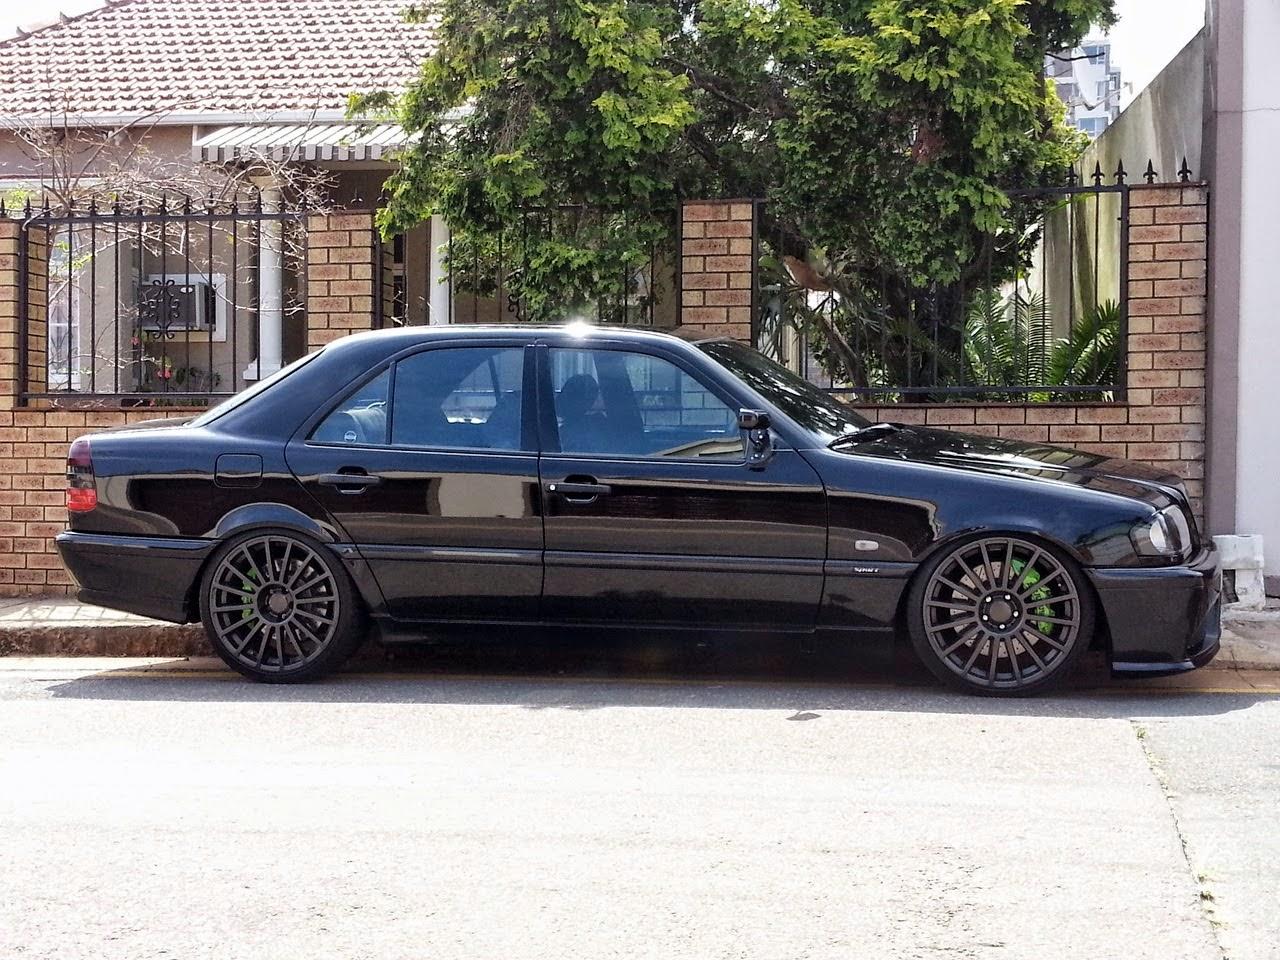 Custom Classic Car Wallpapers Mercedes Benz W202 Turbo Shadowline Benztuning